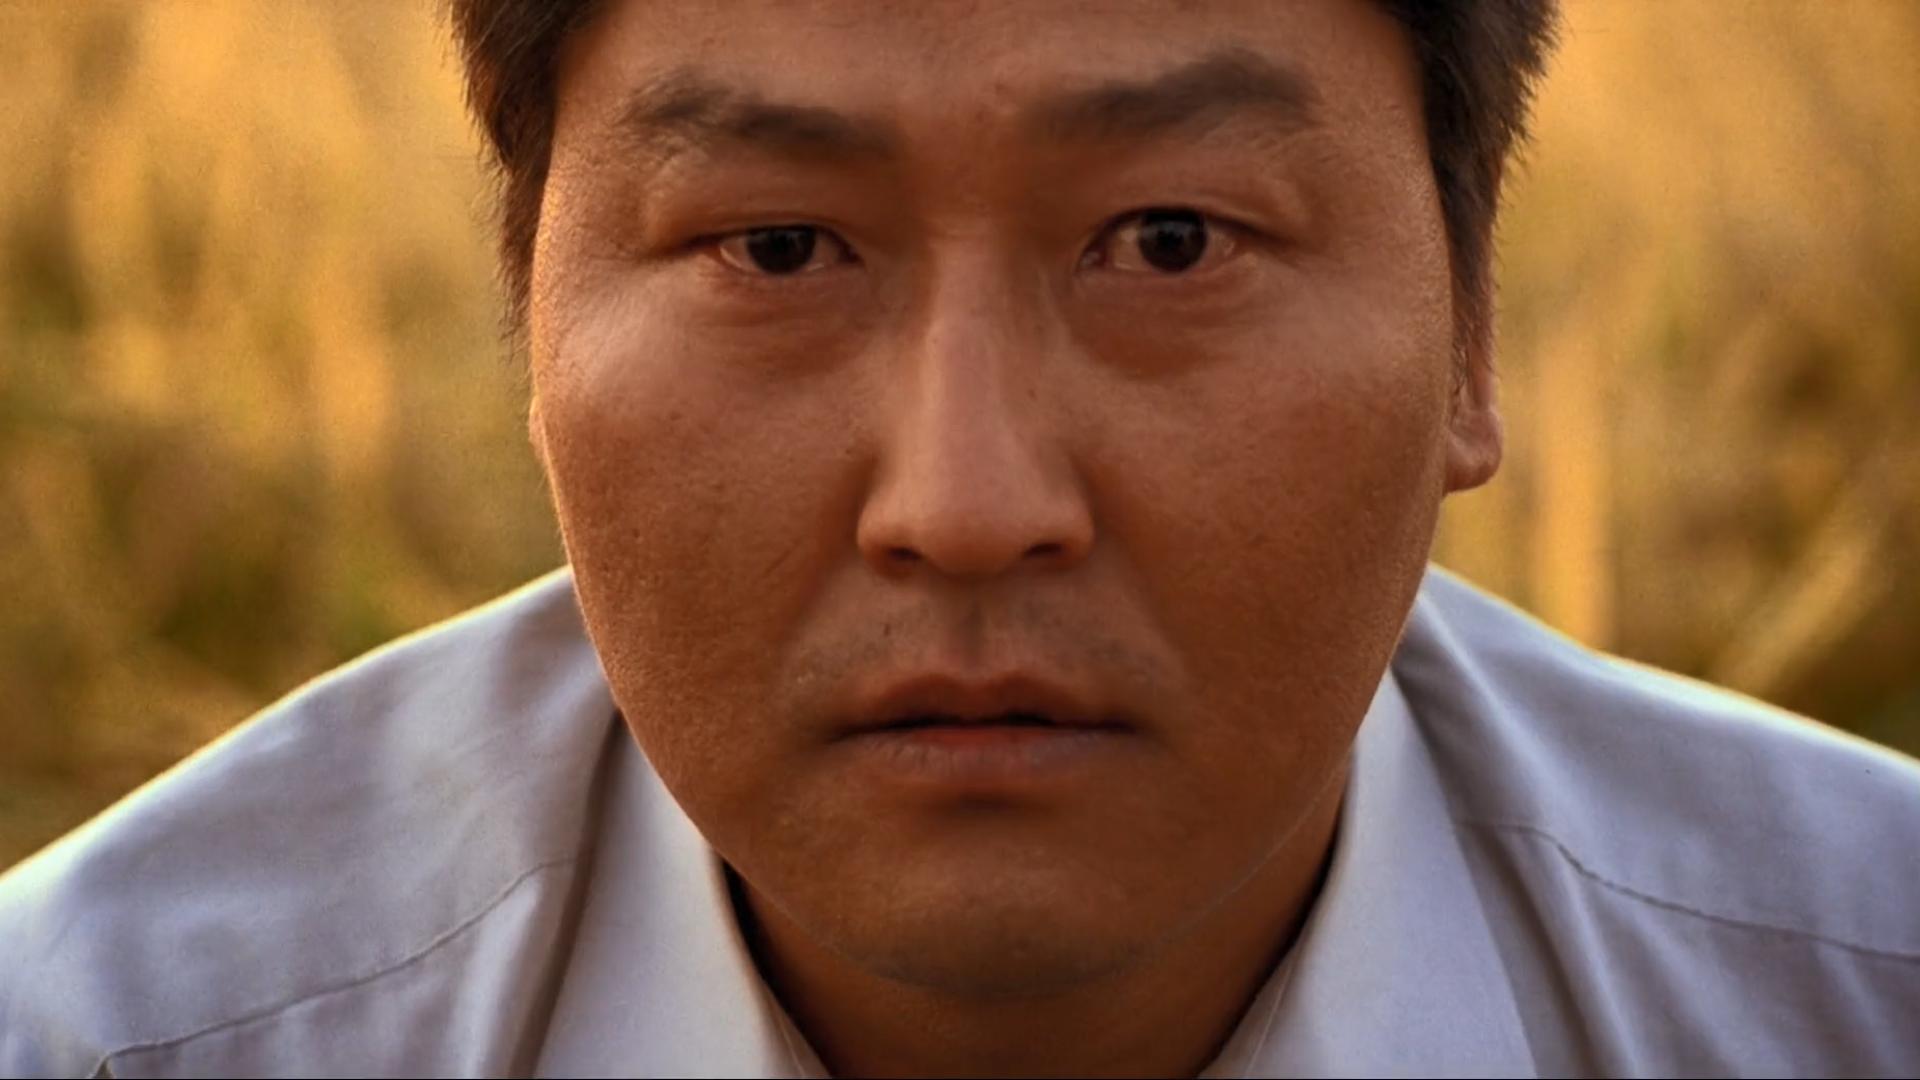 「oioi」韩国三大真实悬案上 • <杀人回忆>